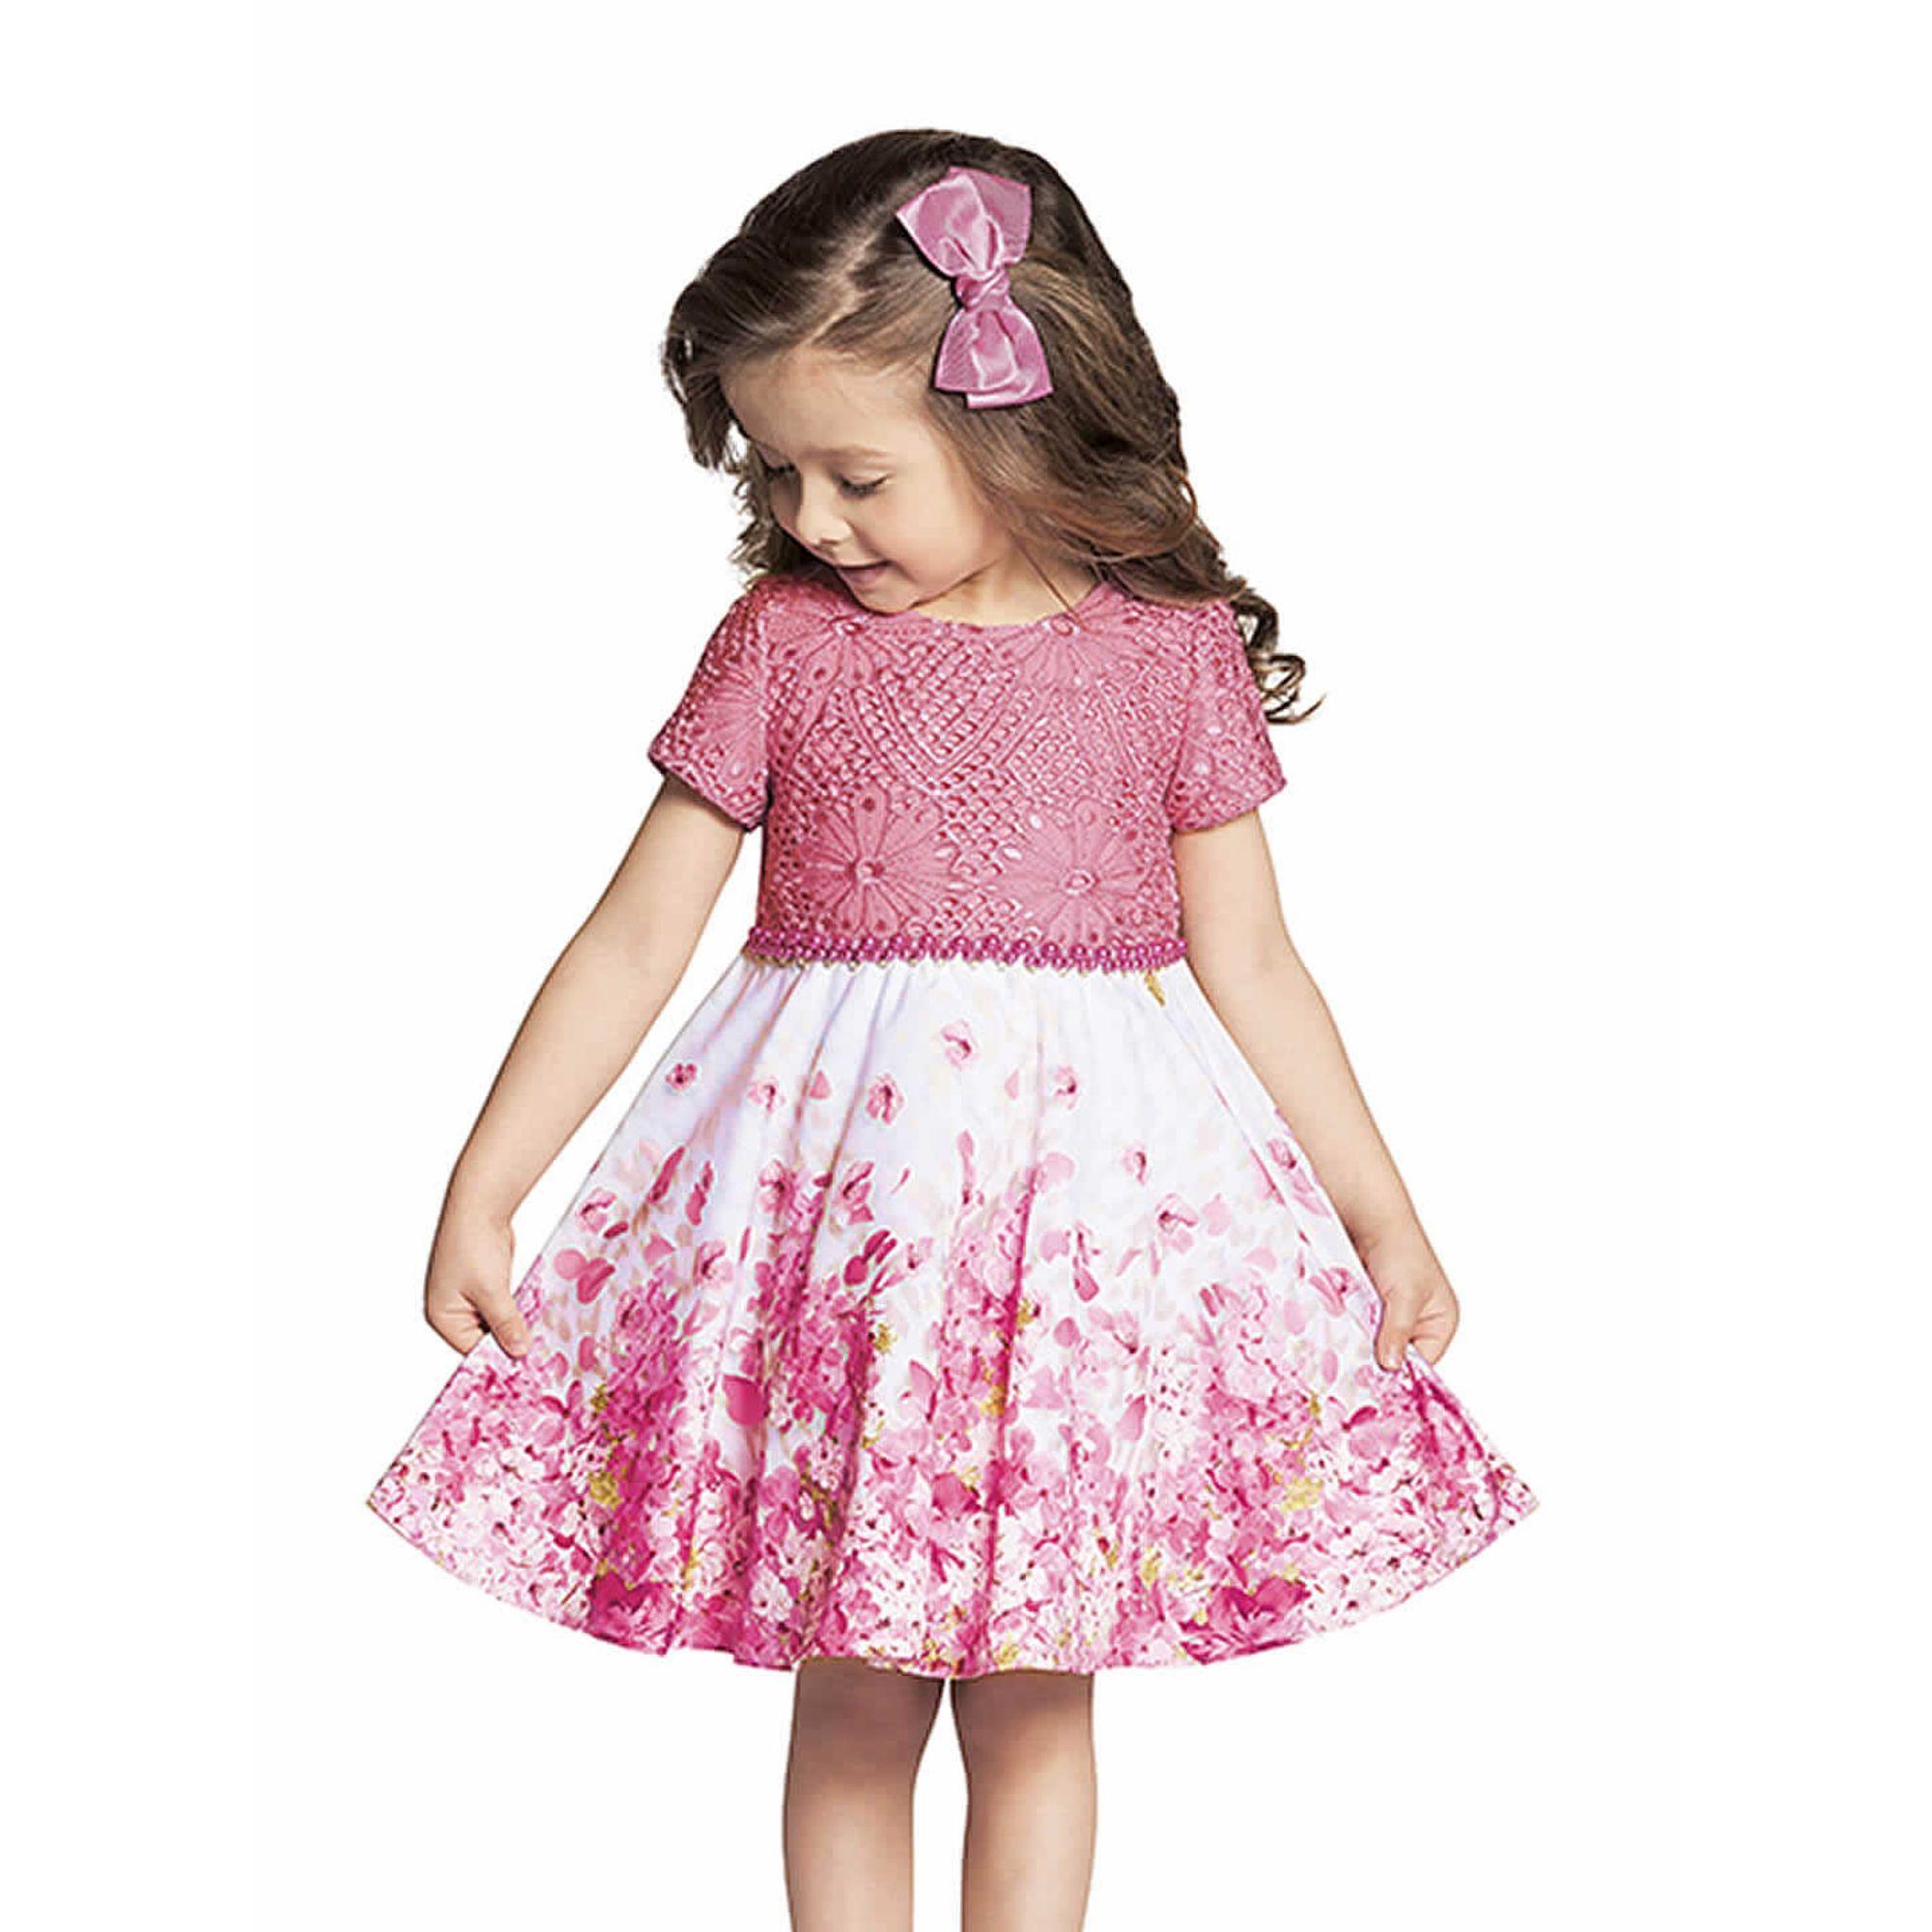 7a3568c3c530 Vestido Infantil Festa Corpo Renda Pink e Saia Florida Branco e Pink -  Ninali - EcaMeleca